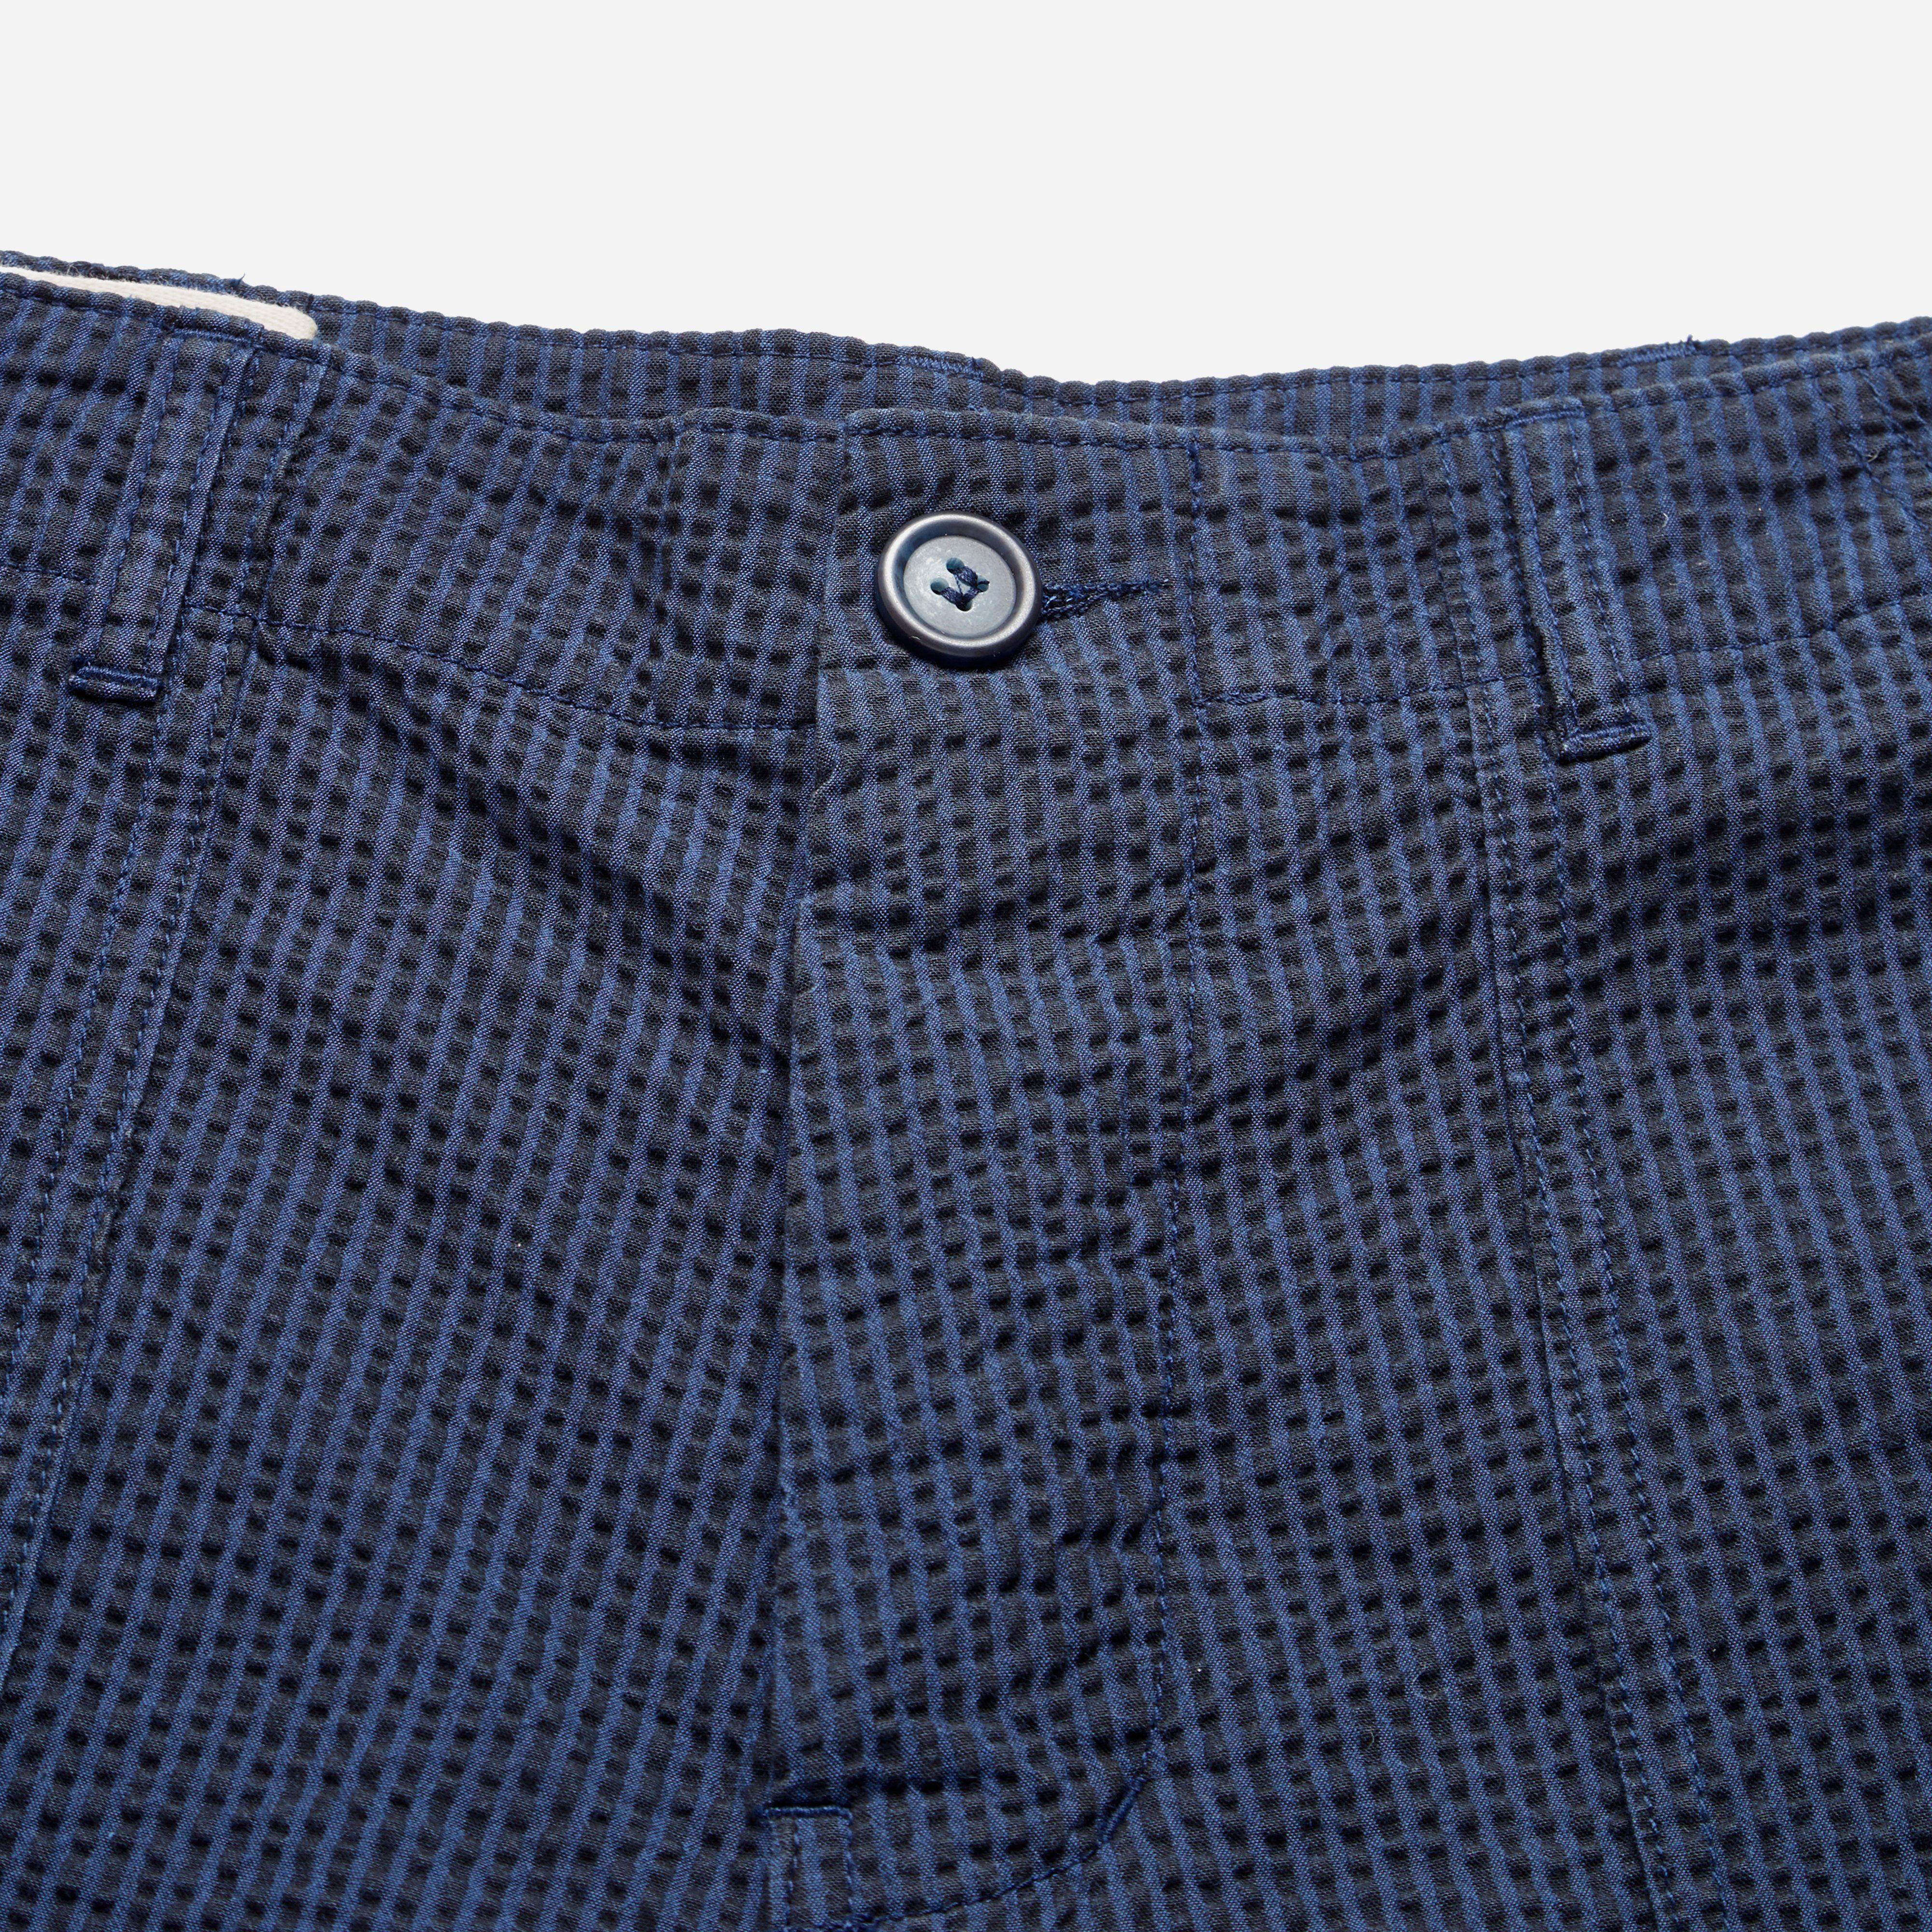 Bleu De Paname Fatigue Shorts